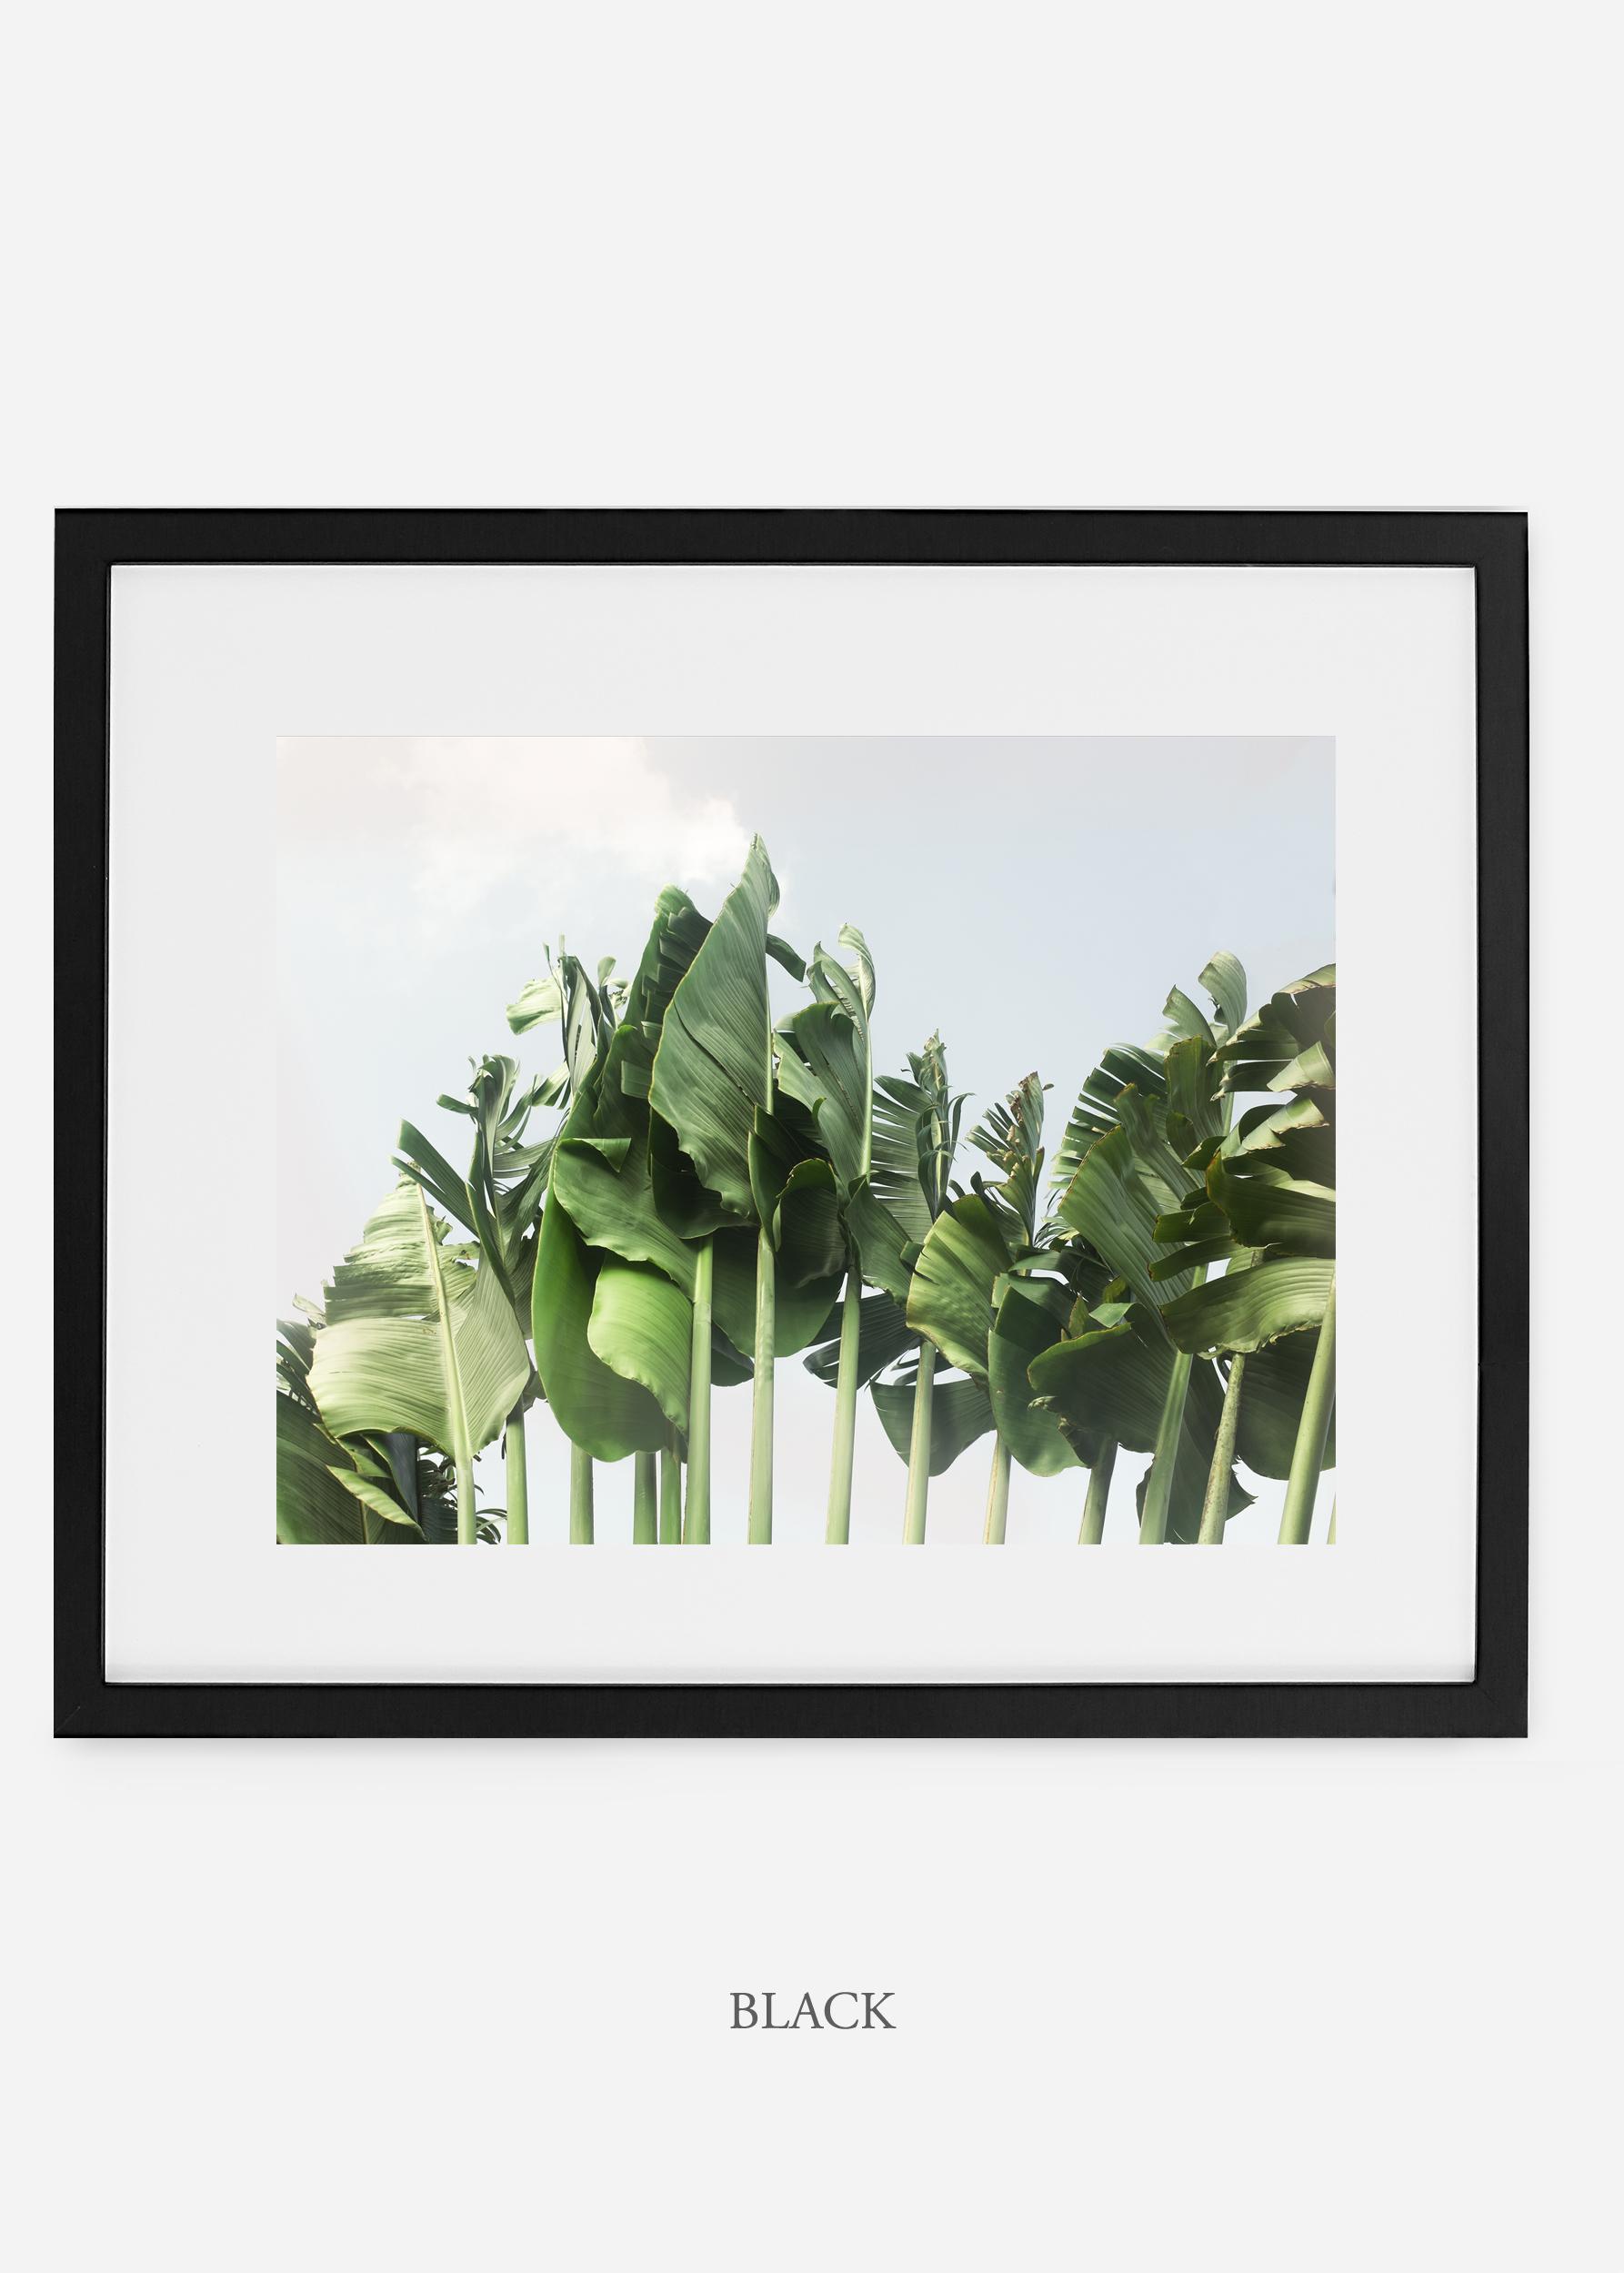 wildercalifornia_blackframe_tulum_bananaleaf_No.1_minimal_cactus_art_interiordesign_blackandwhite.jpg